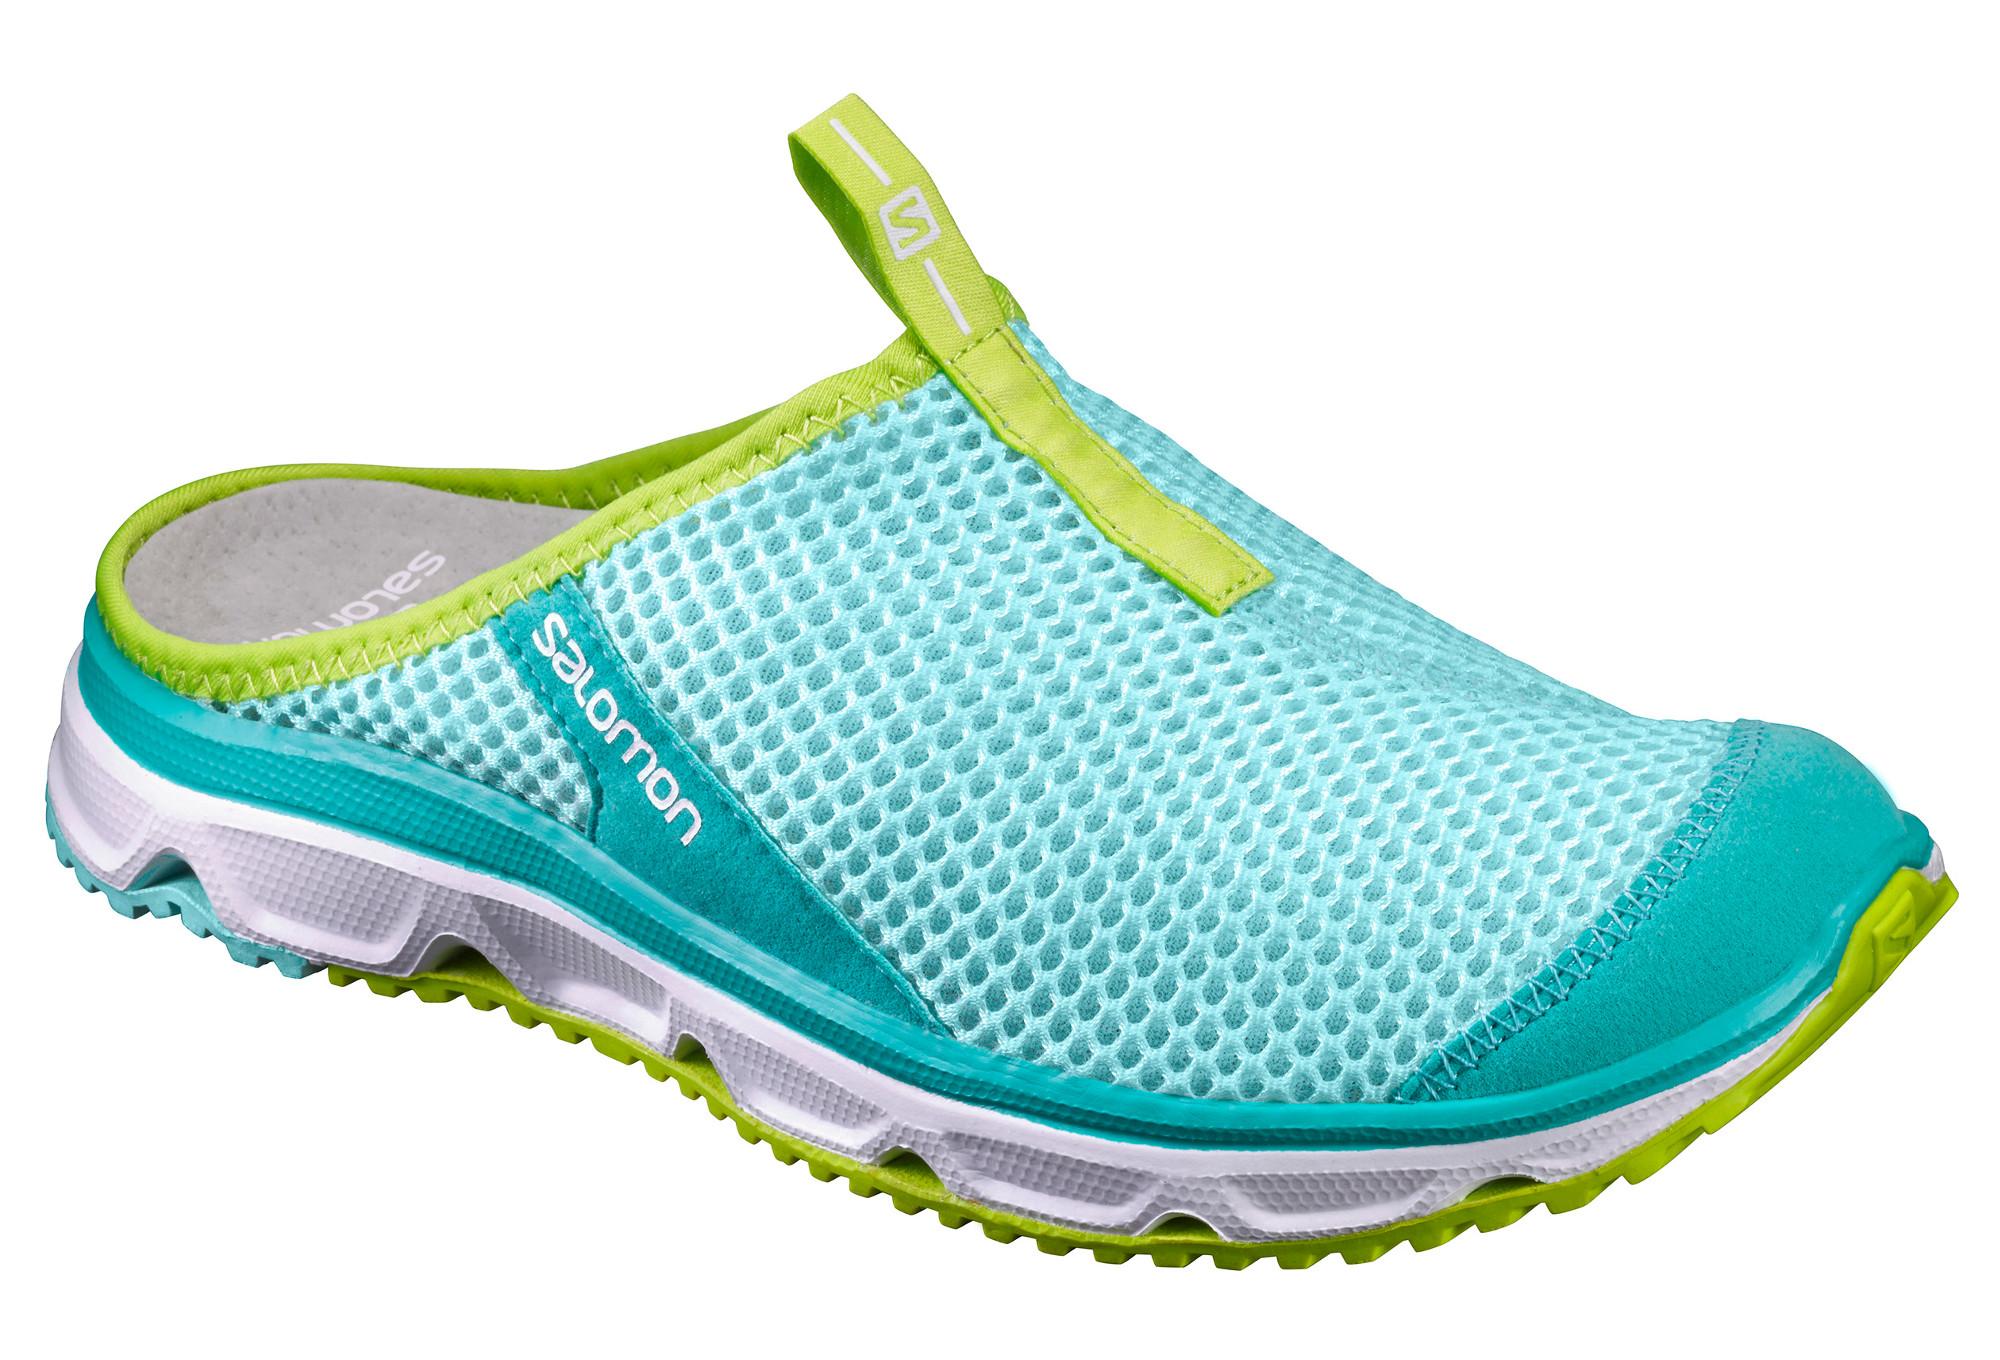 Chaussures de Récupération SALOMON RX SLIDE 3.0 Femme Bleu Vert